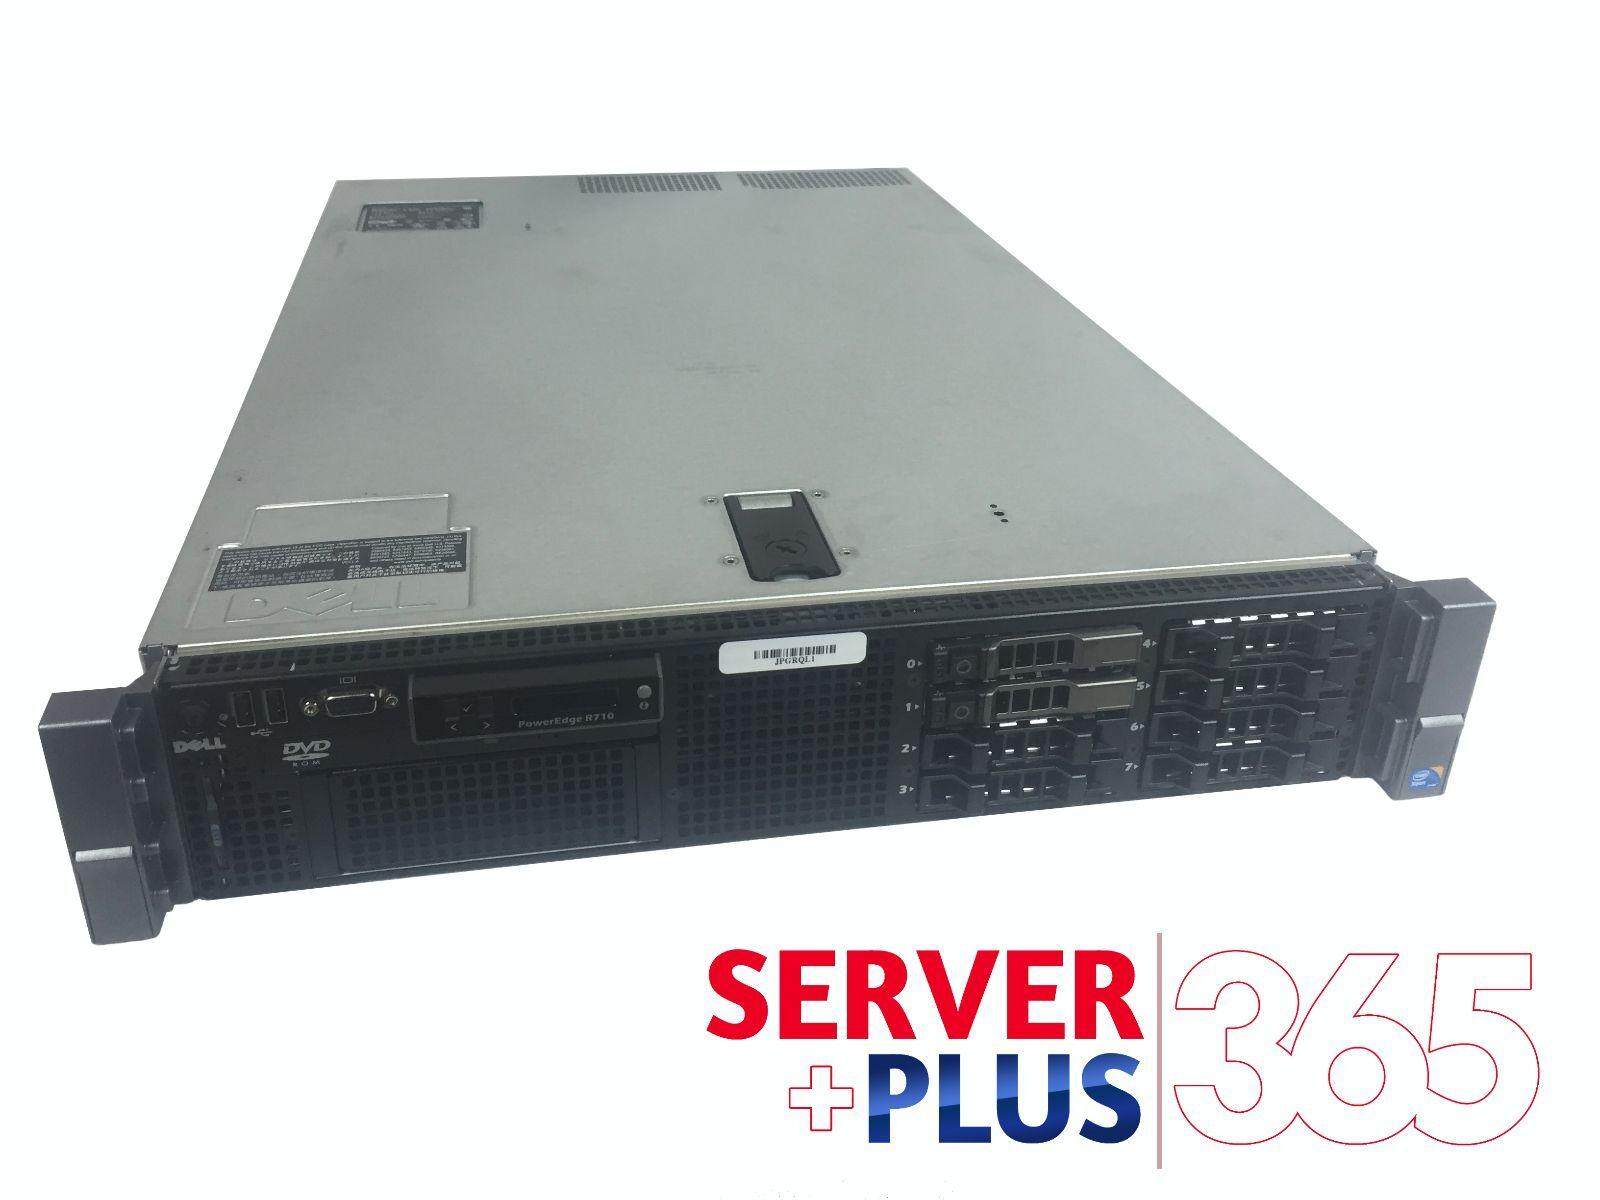 Details about Dell PowerEdge R710 8-Core 2 5